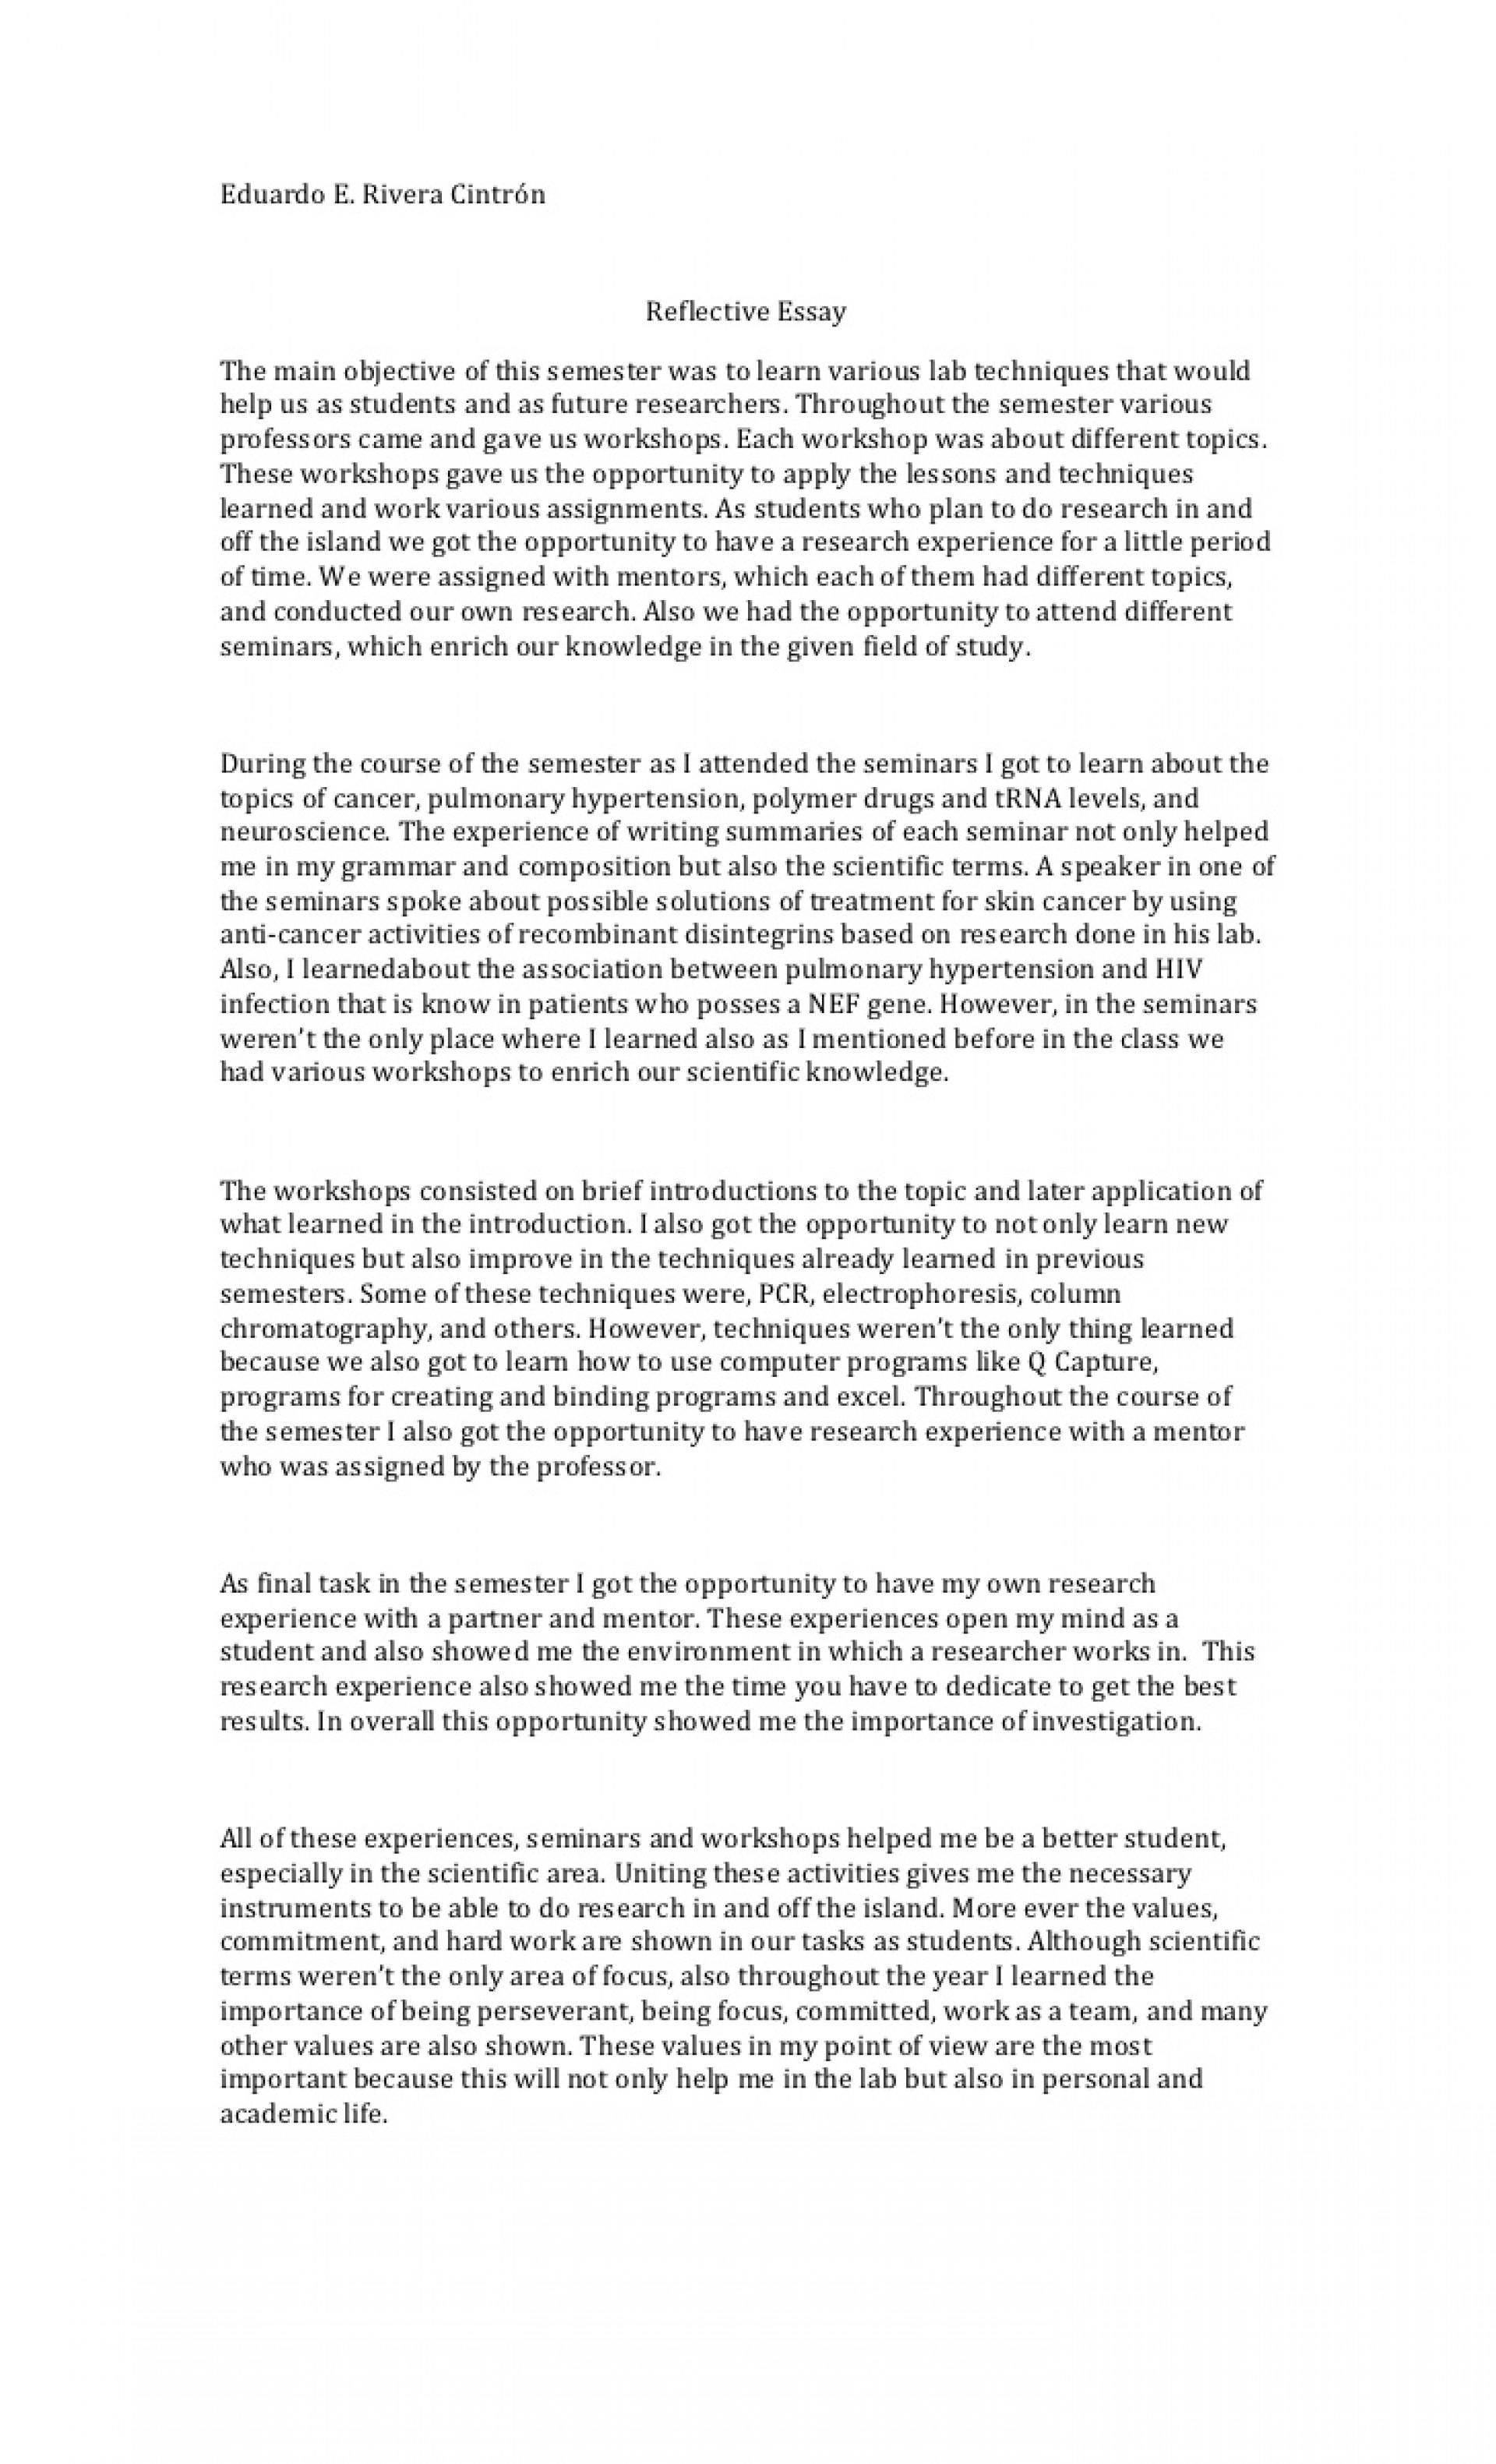 Write argumentative term paper